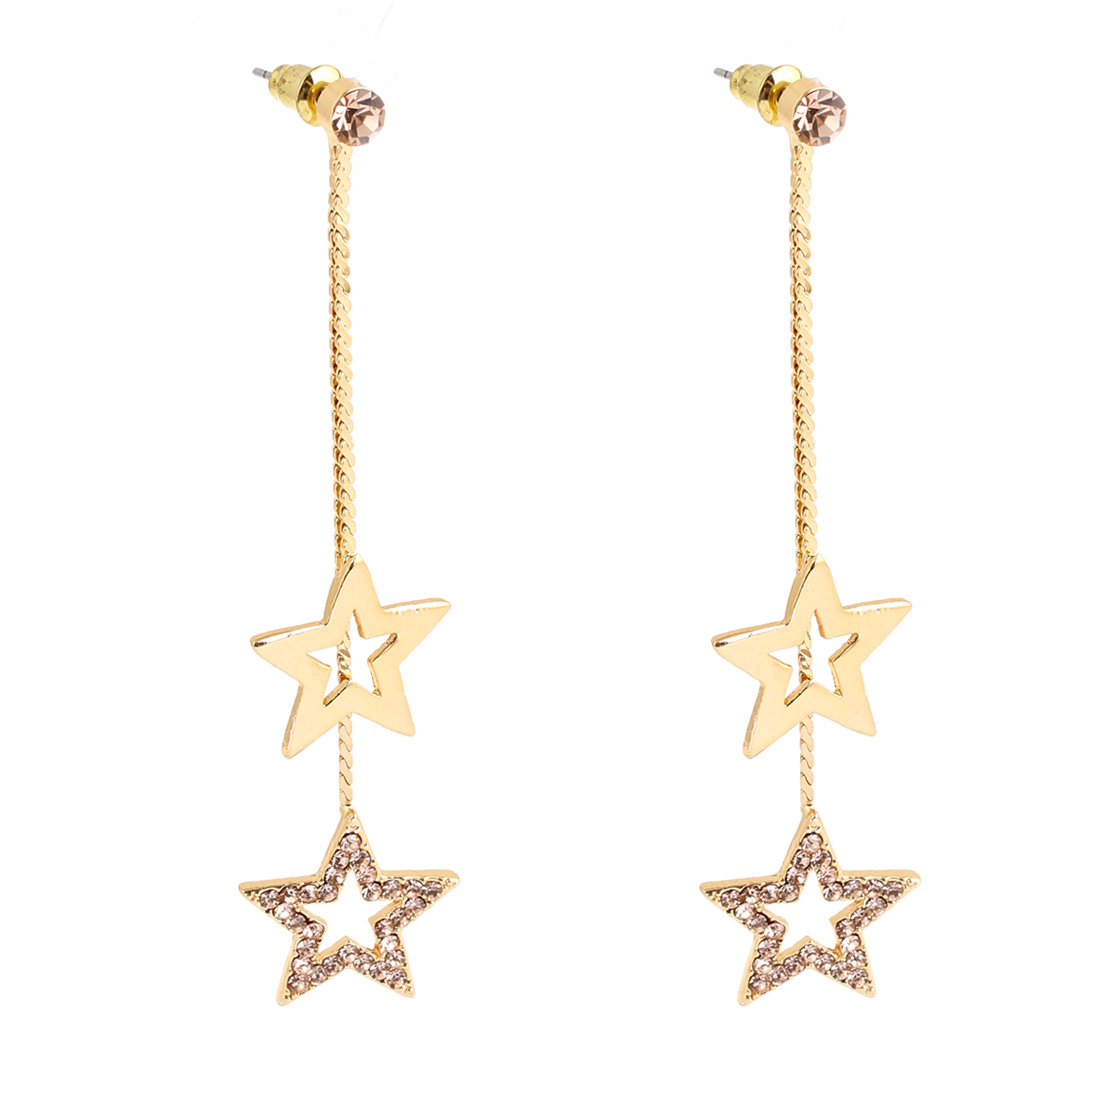 Ladies Rhinestone Inlaid Stars Pendant Fish Hook Earrings Gold Tone